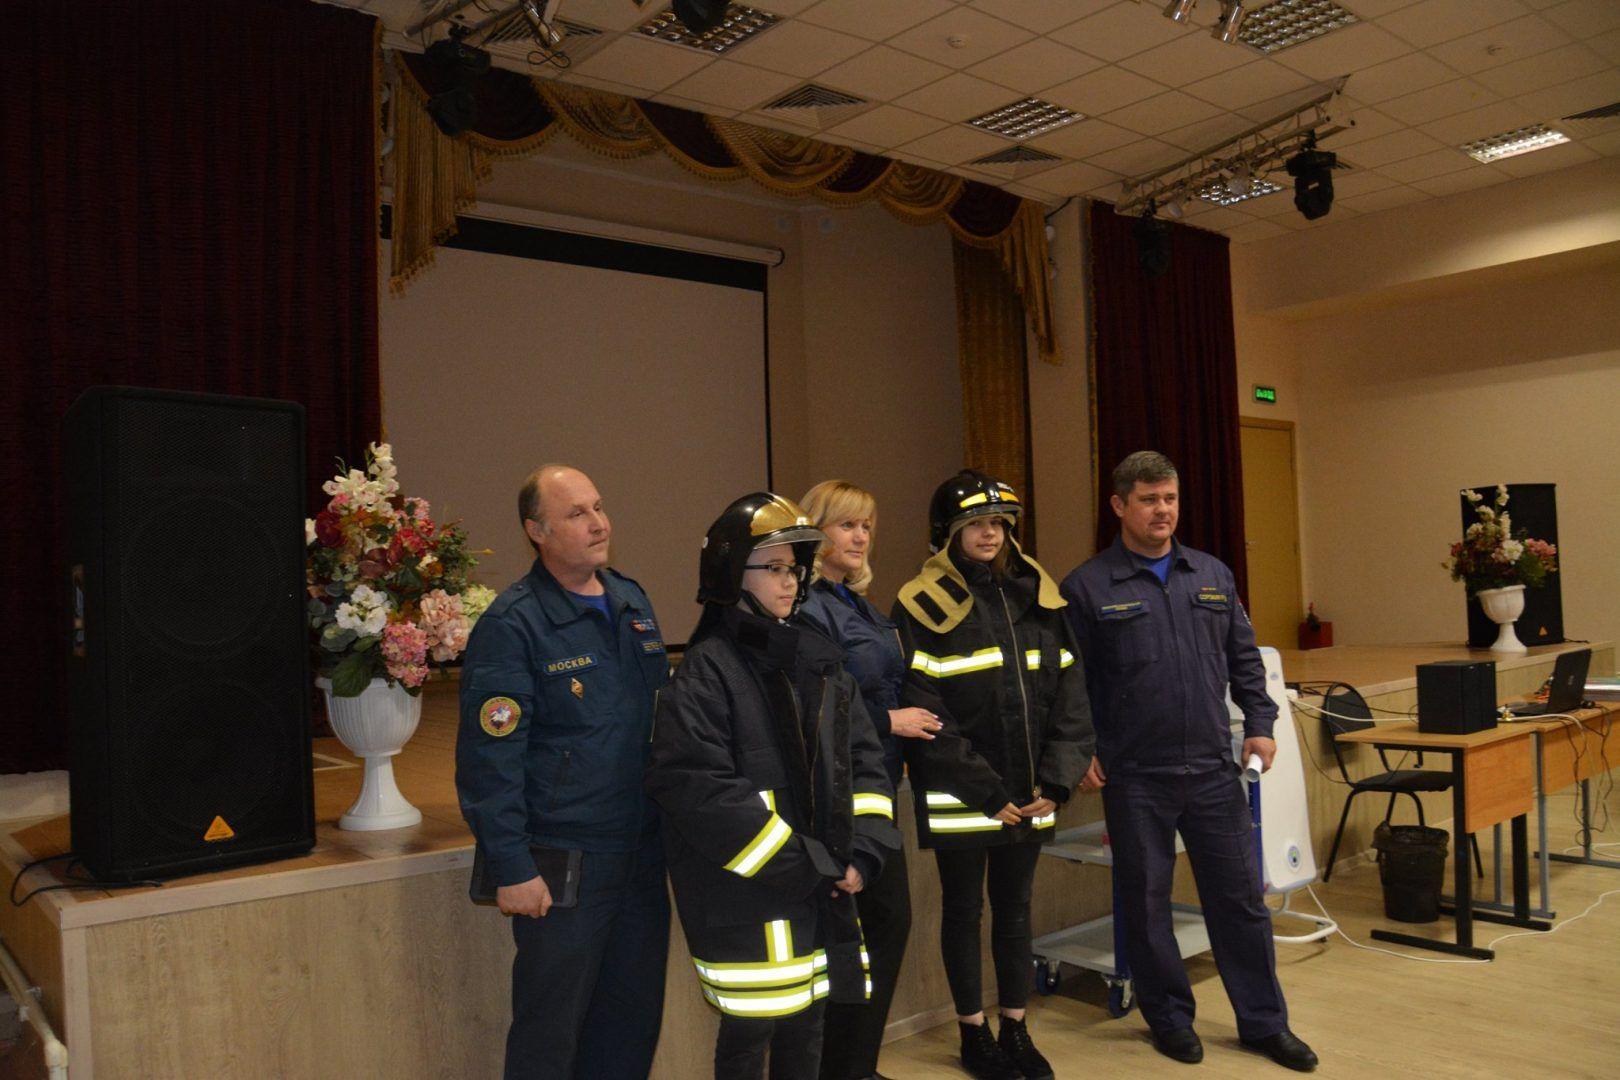 Московские спасатели проводят «Уроки мужества». Фото: пресс-служба Управления по ТиНАО Департамента ГОЧСиПБ